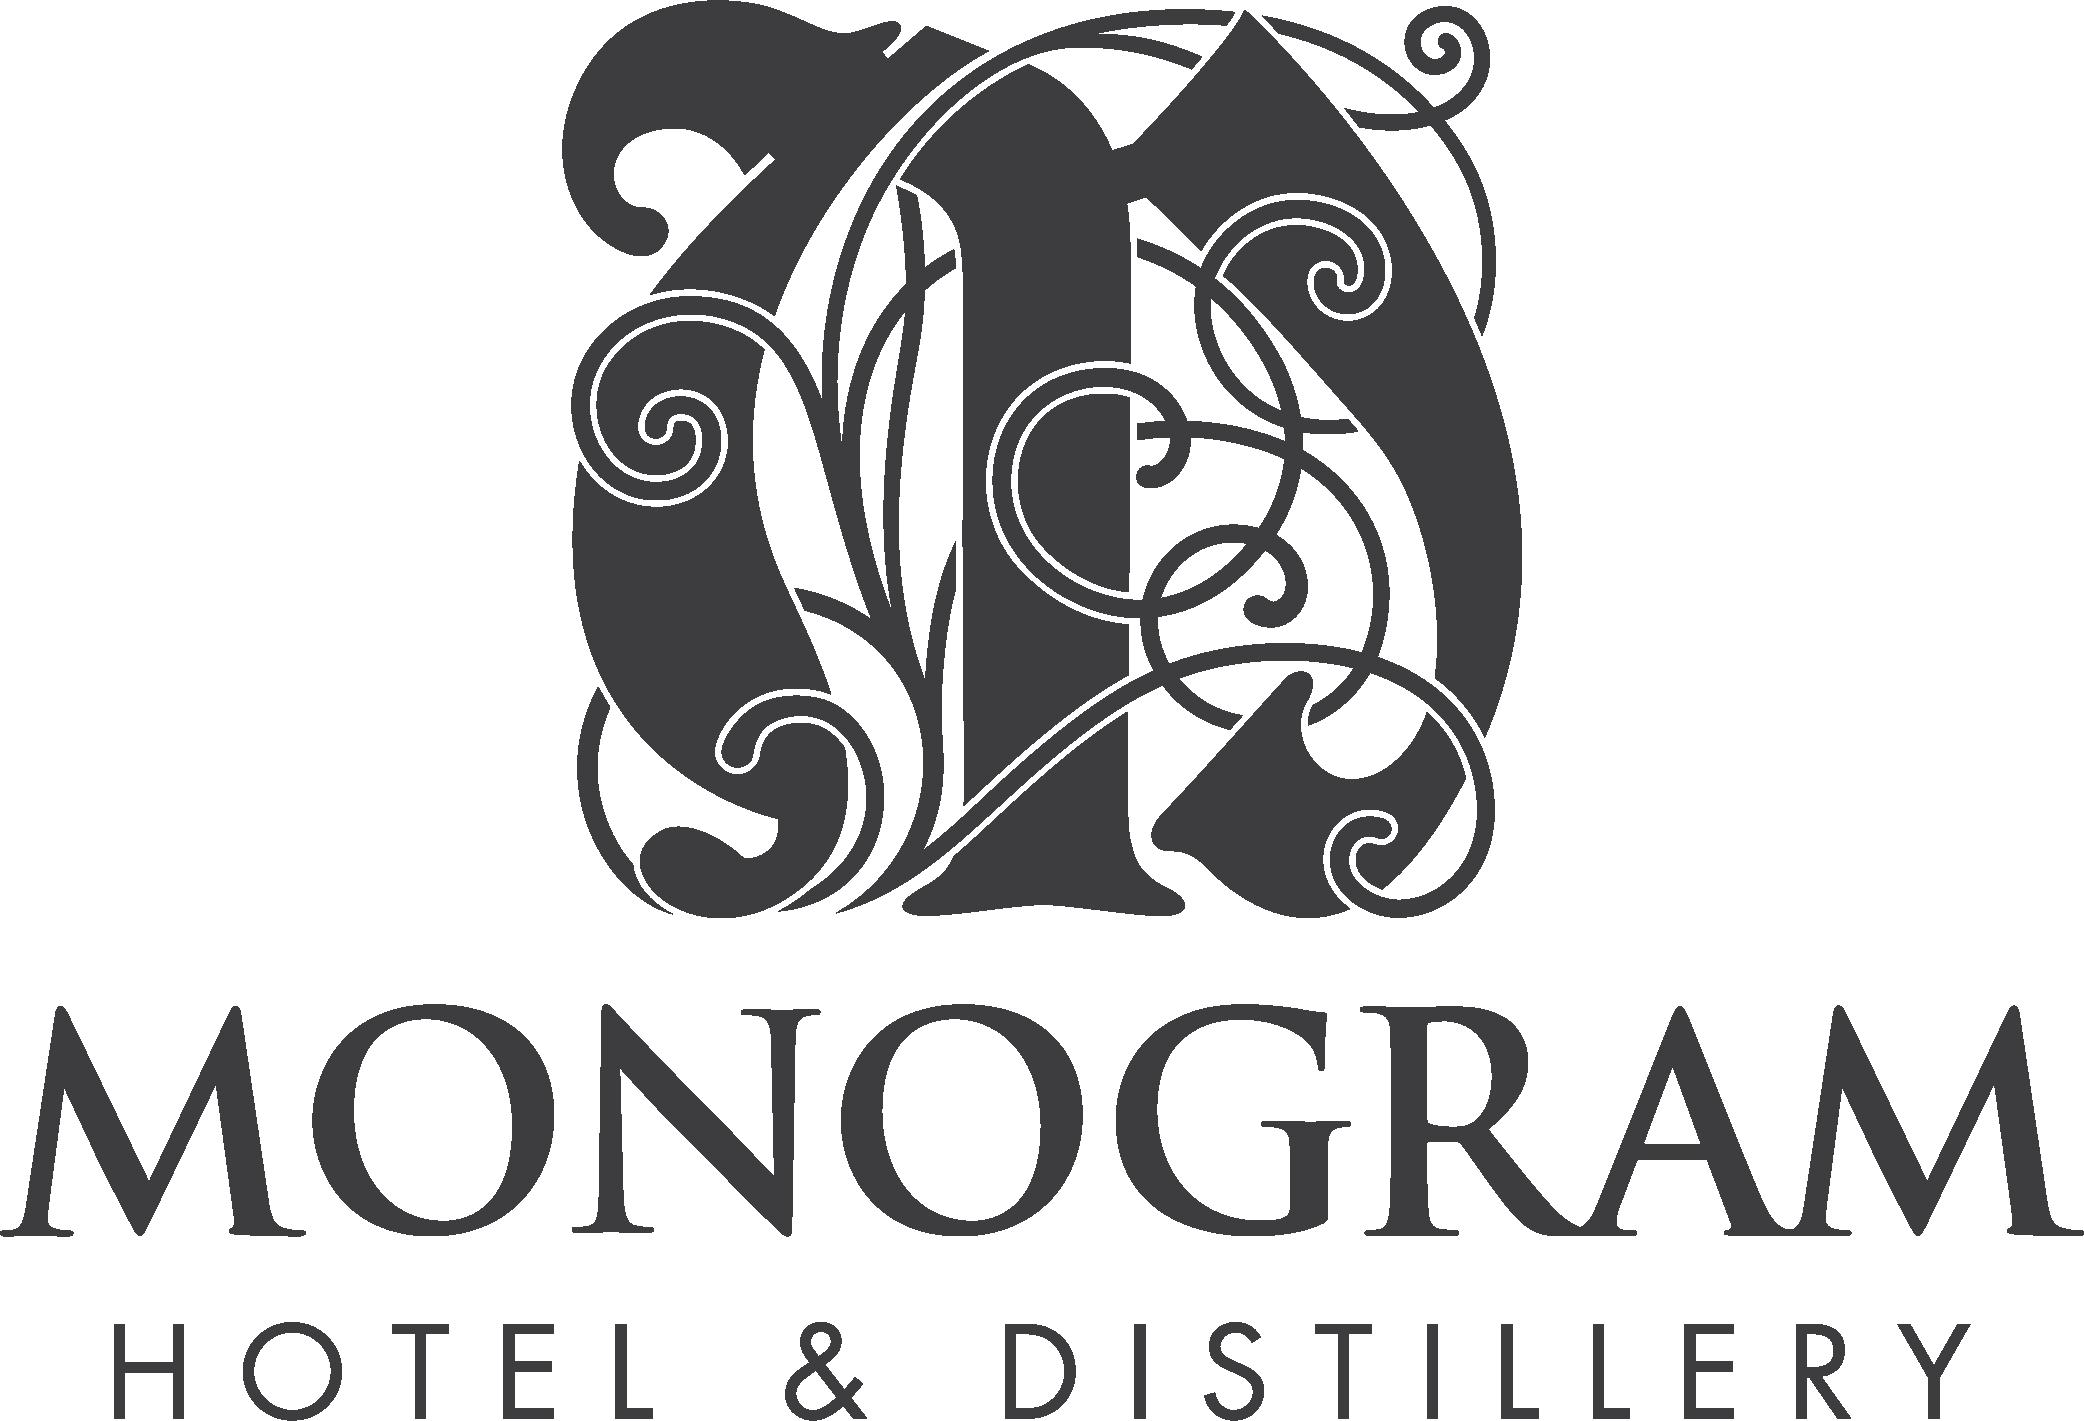 Hotel & Distillery Monogram